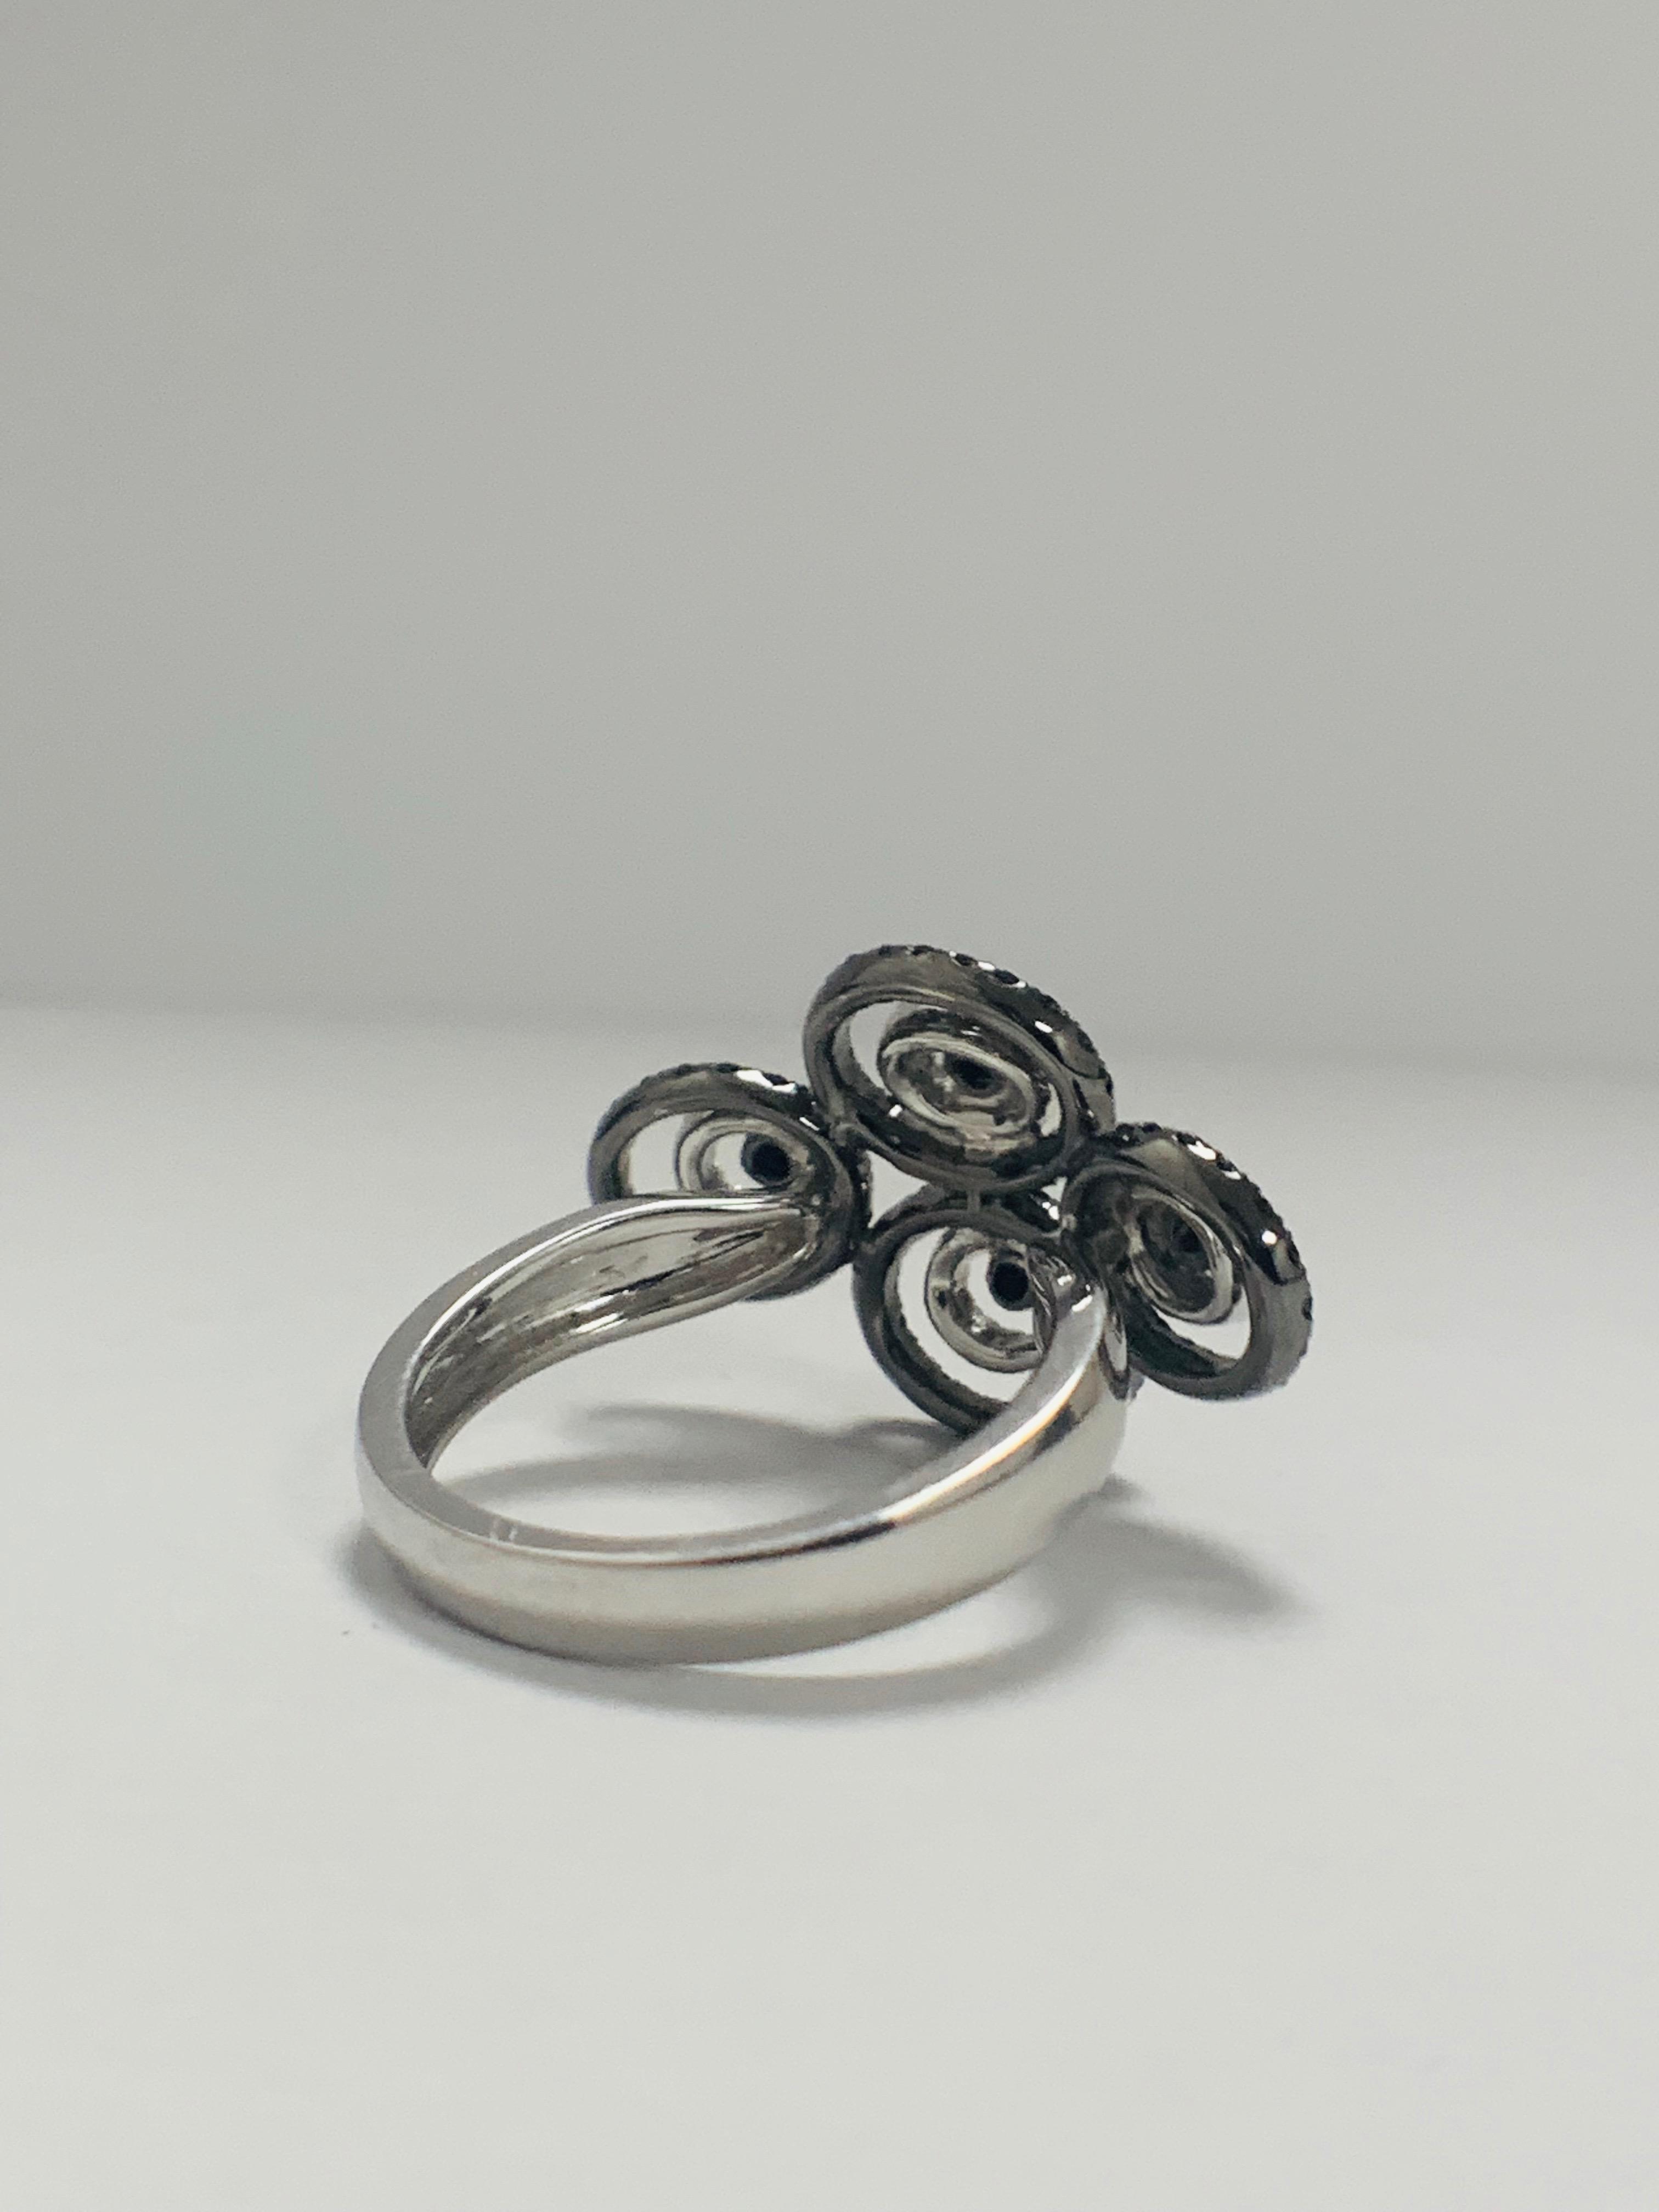 18ct White Gold Diamond ring featuring 80 round cut, black Diamonds (0.61ct TBDW) - Image 5 of 12